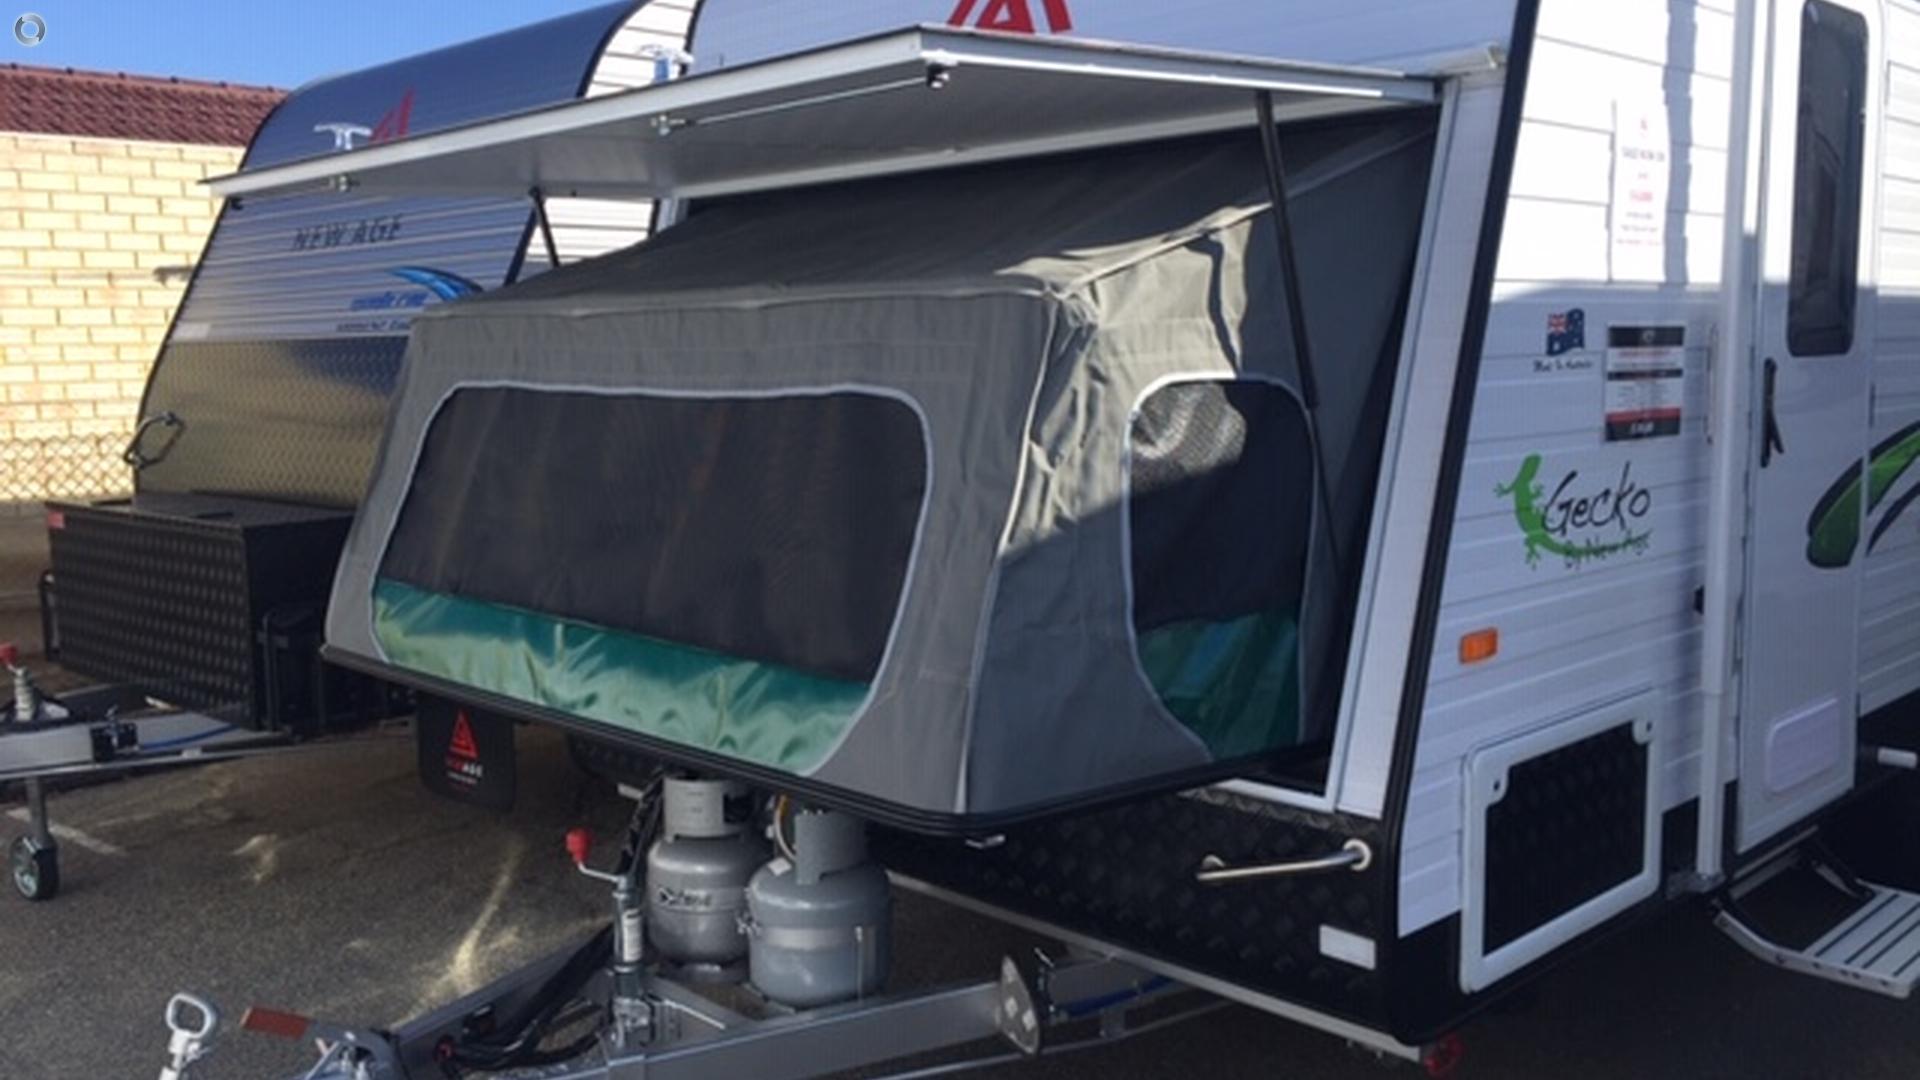 2018 New Age Gecko 16 bunk family Caravan GE16BE